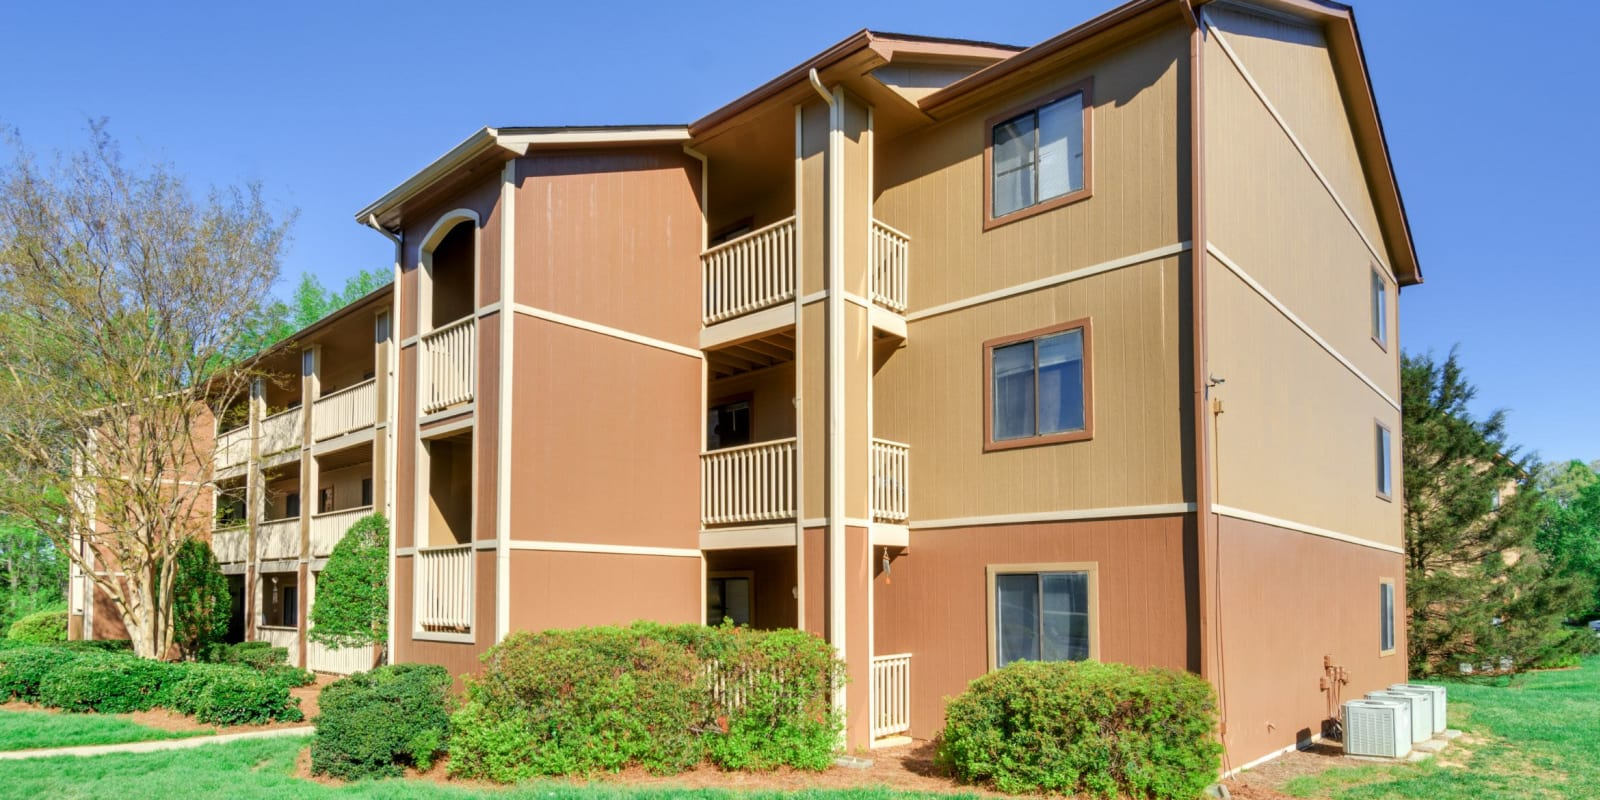 Beautifully manicured landscape at Woodbrook Apartment Homes in Monroe, North Carolina